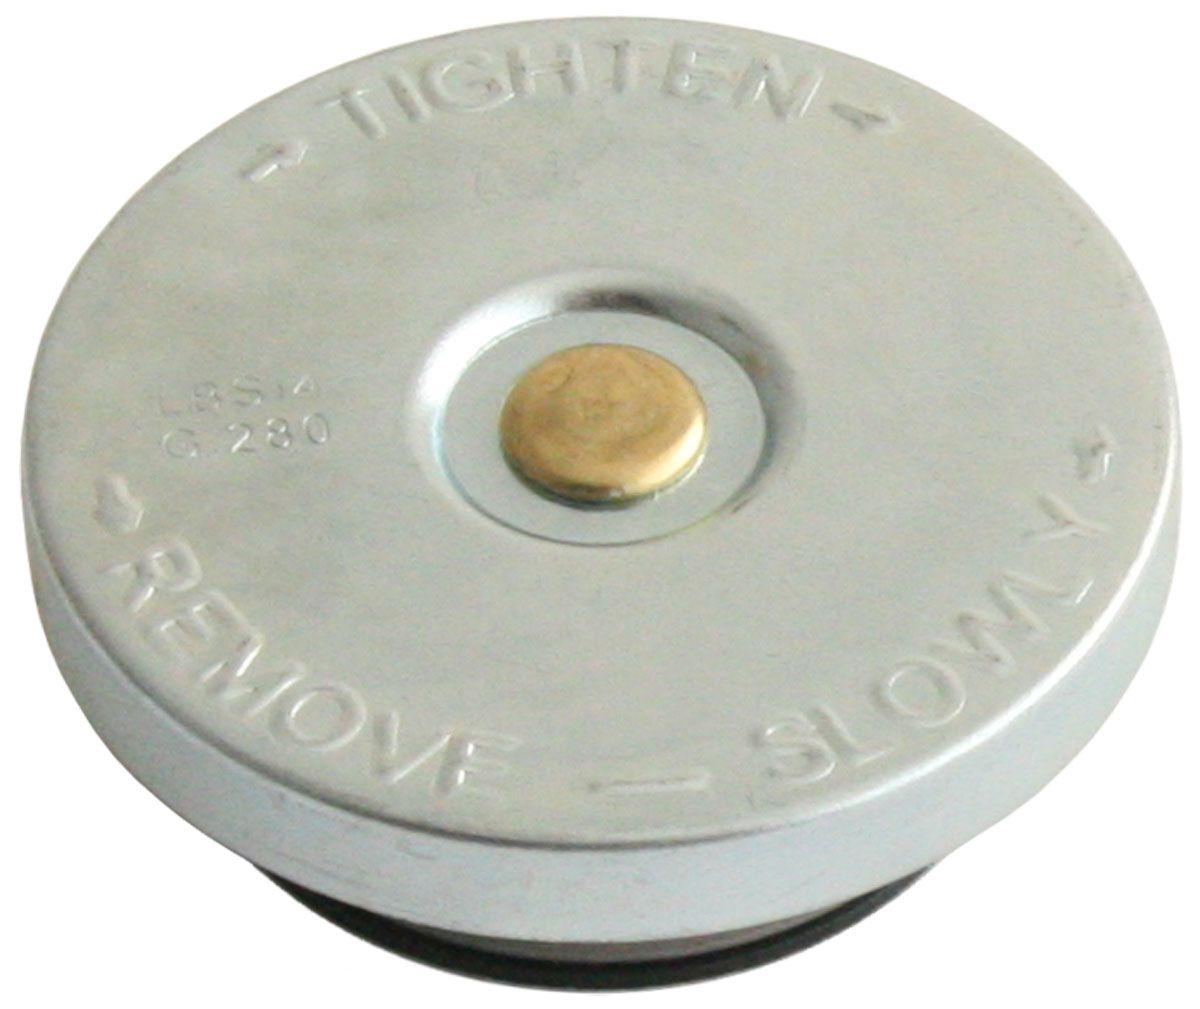 EMMARK FORDSON RADIATOR CAP - (50888434950915)